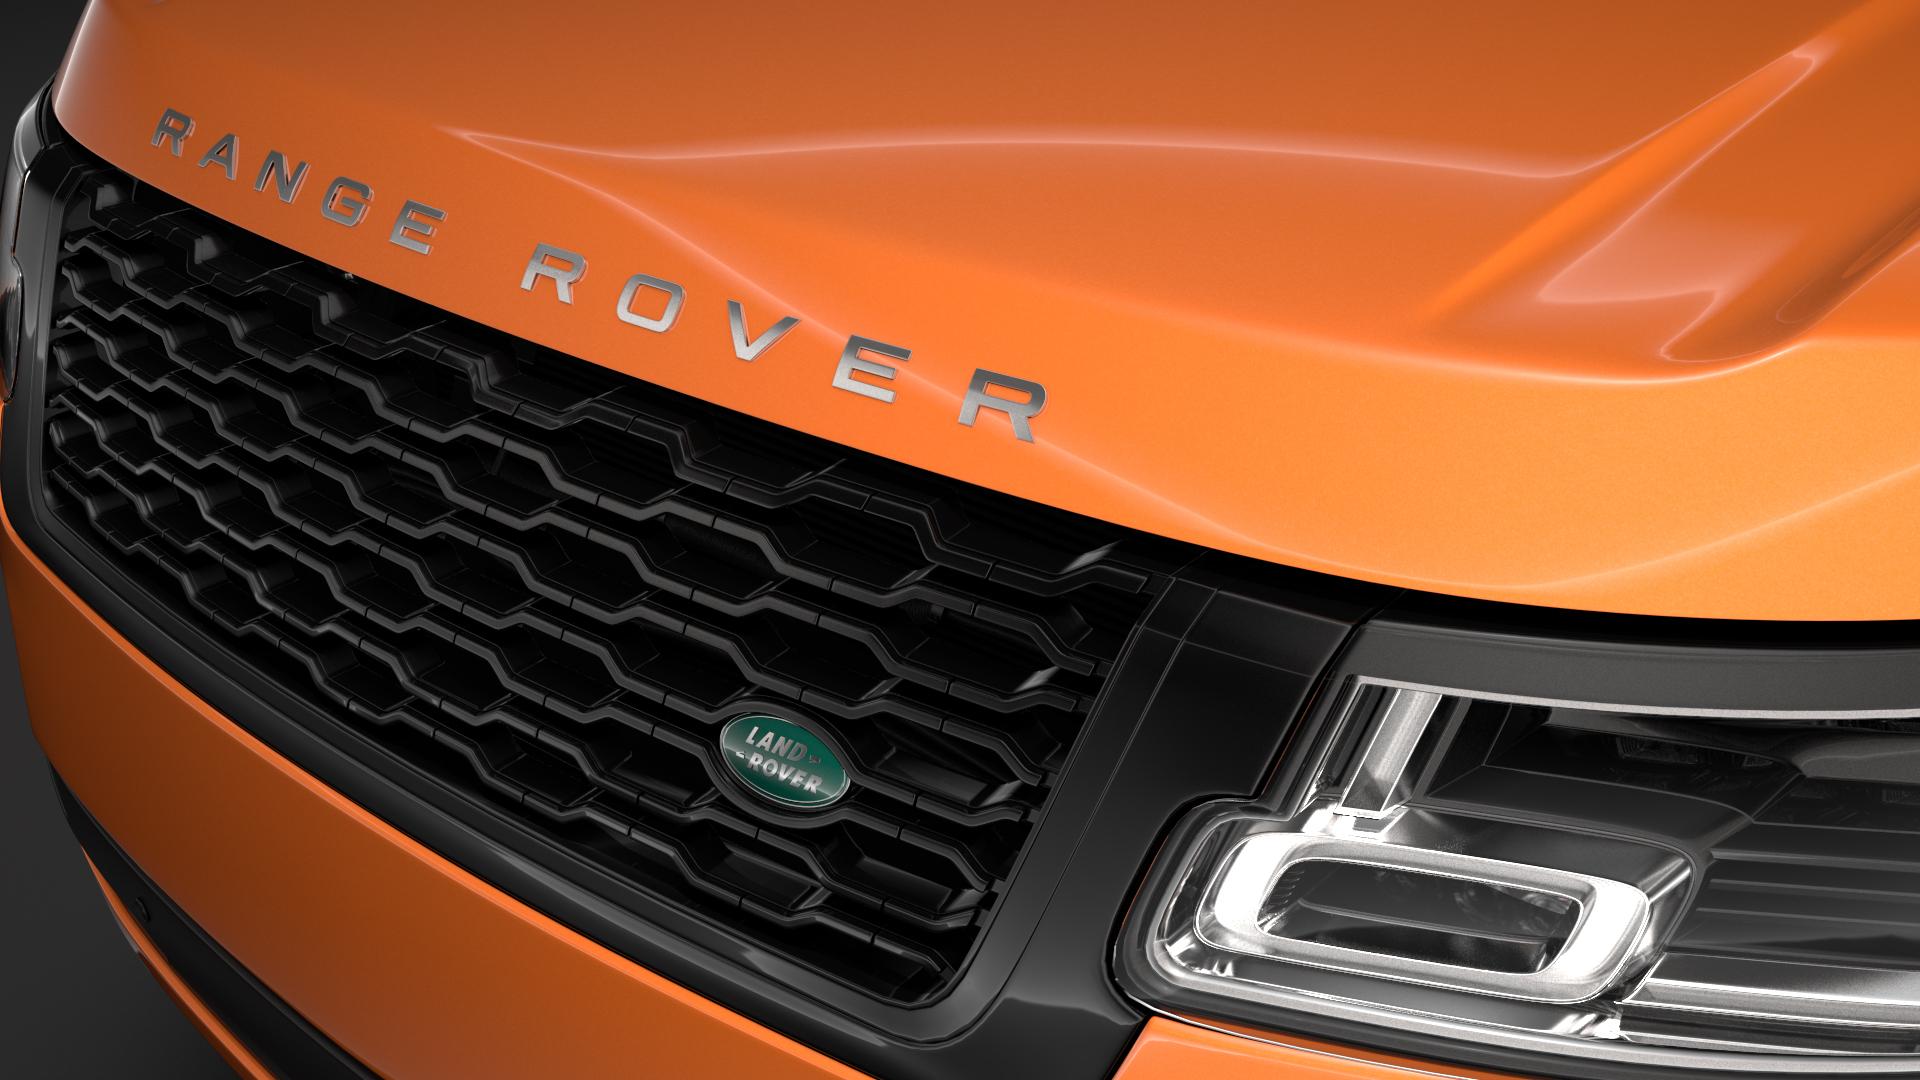 range rover hse td6 lwb l405 2018 3d model max fbx c4d lwo ma mb hrc xsi obj 277388